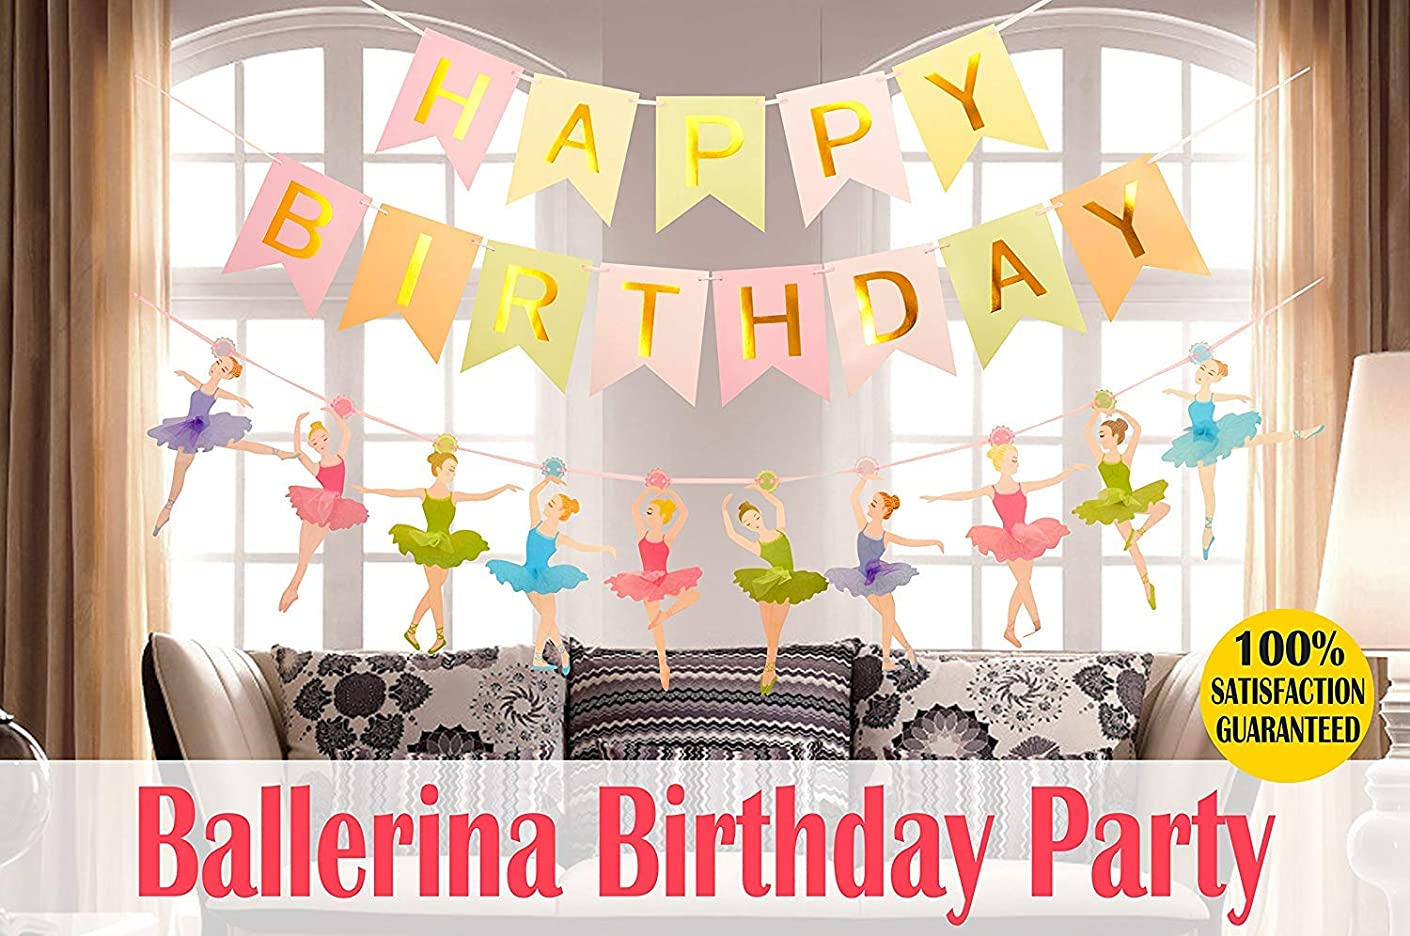 MEANT2TOBE Ballet Dancer Party Supplies Baby Girl Favor - Happy Birthday Banner-Ballet Girls Dancer Banner Garland for Birthday Party Favors Decor (Ballerina Birthday Party Decoration)